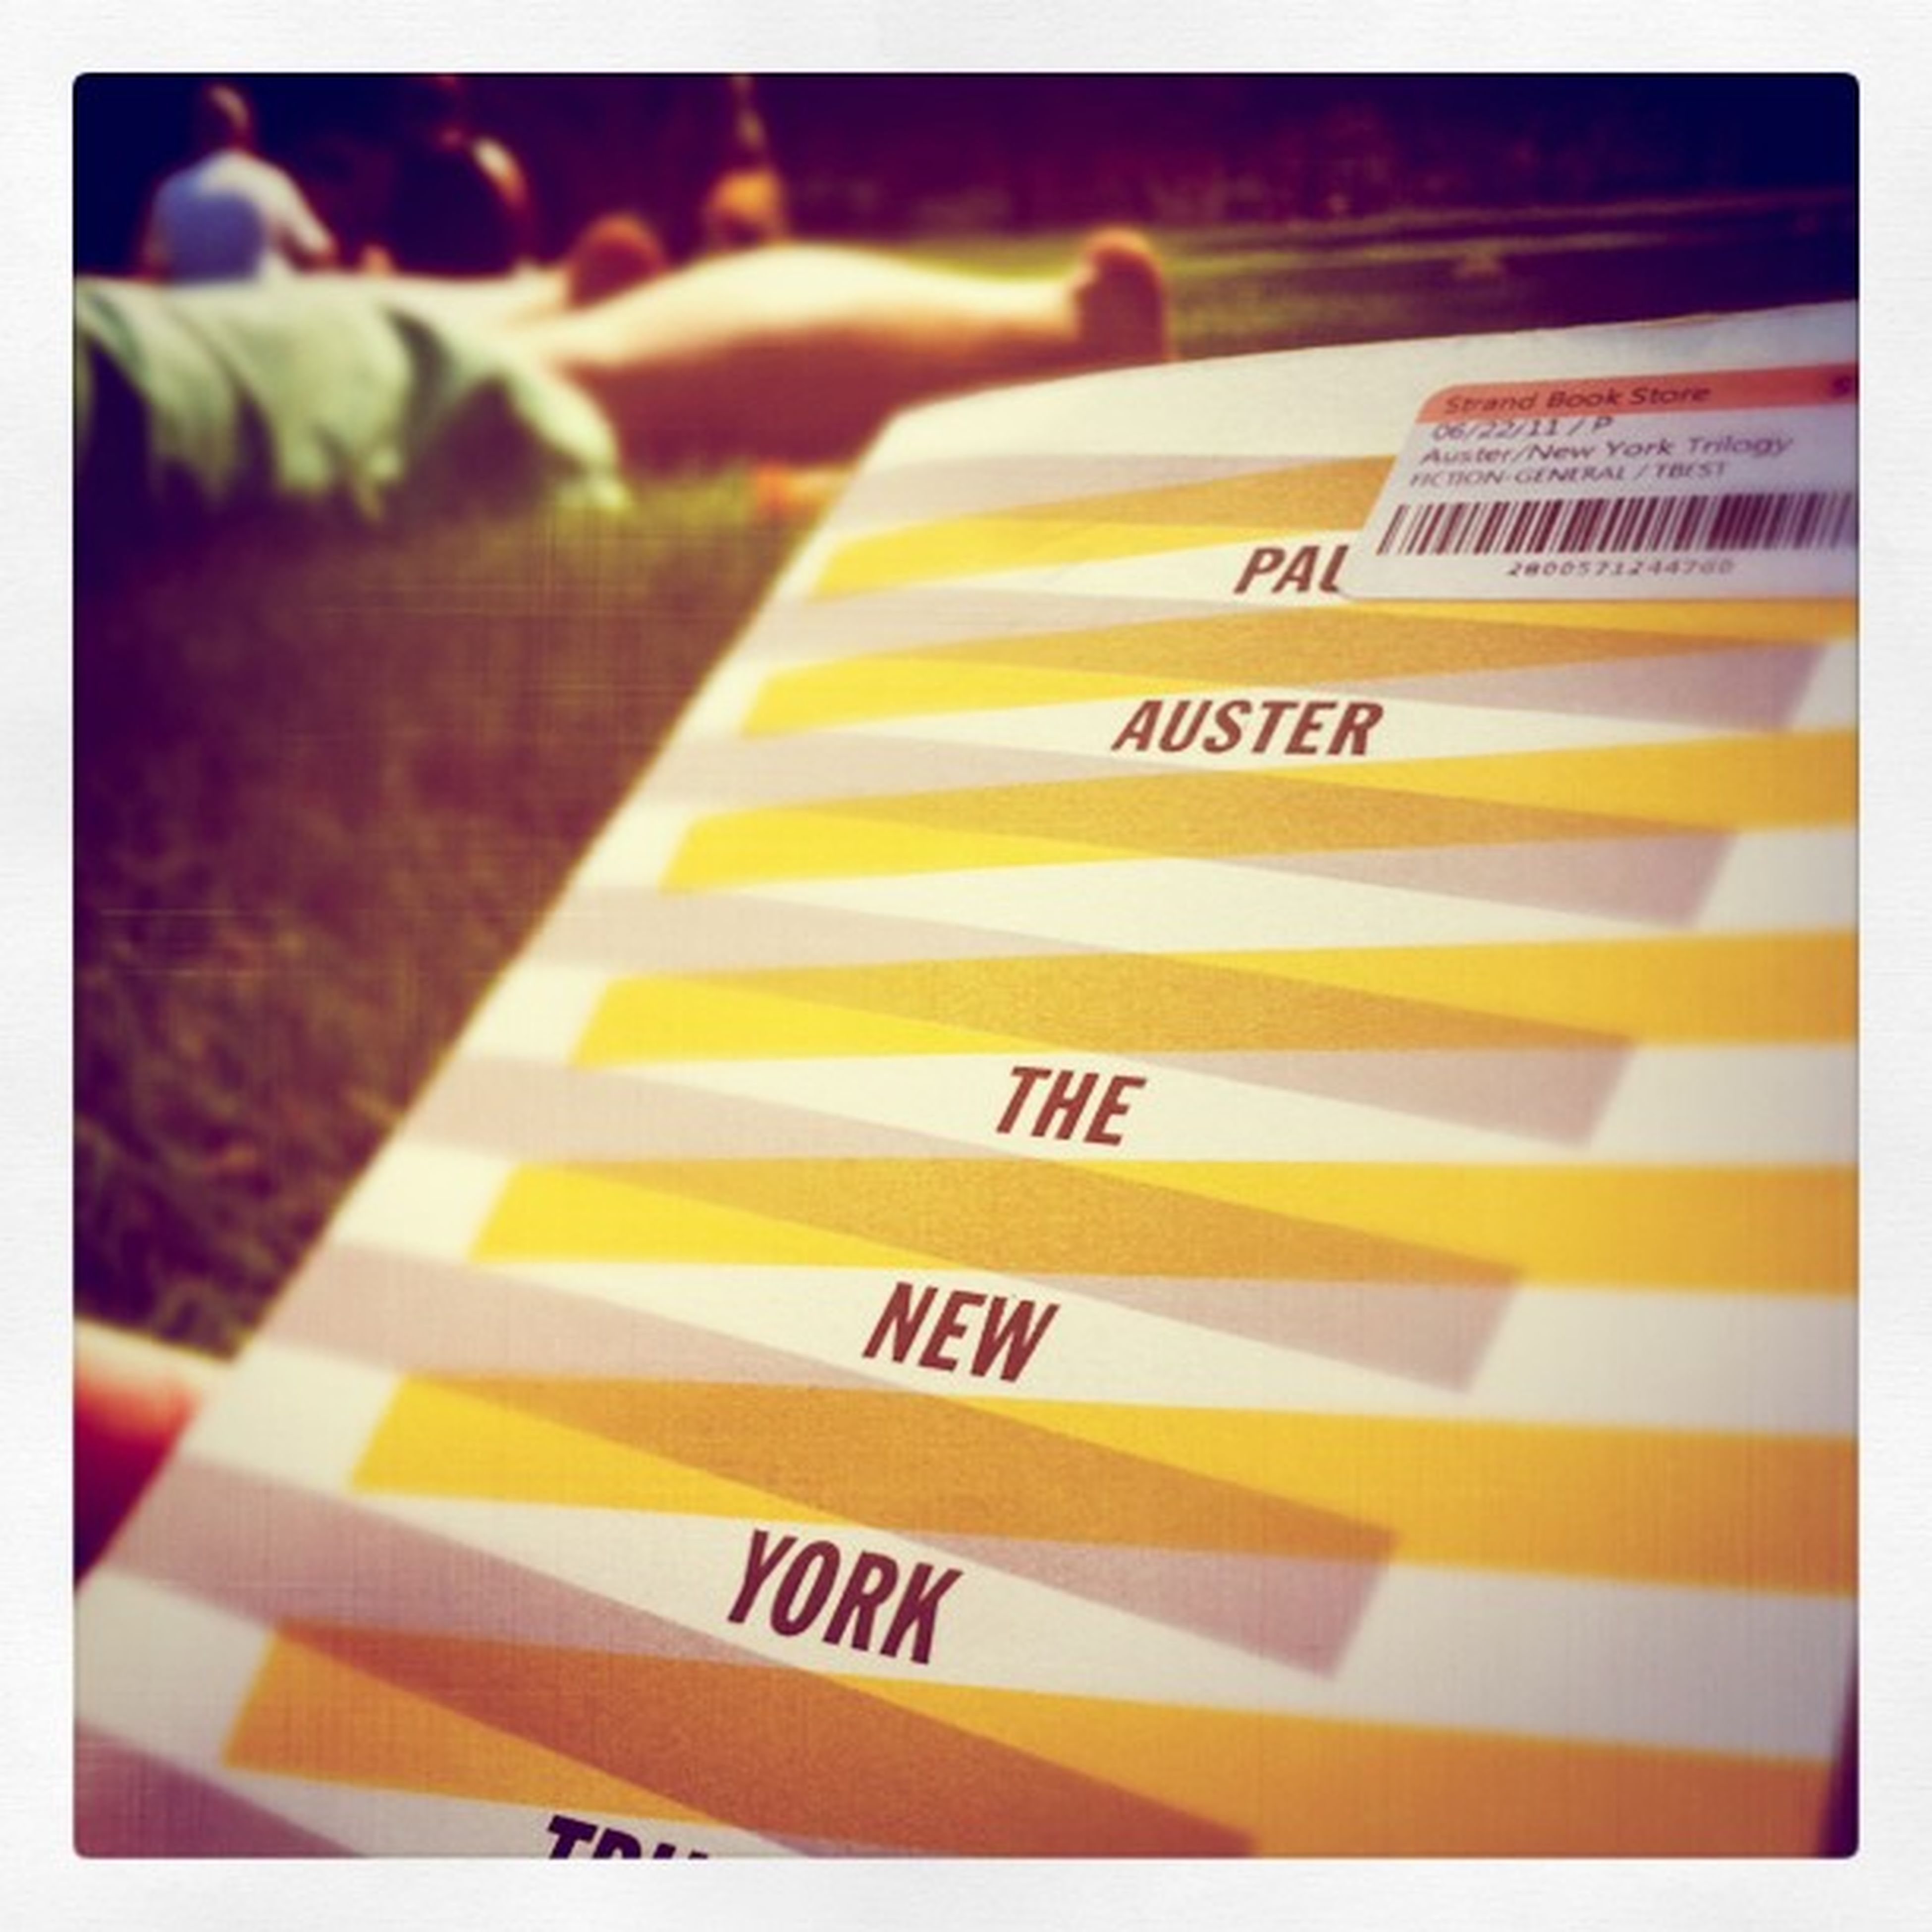 Beer Weekend Summer Sunshine Reading Chill Relax Mystery Park Book Front Newyork Literature Cover Novel Paulauster Strandbooks Newyorktrilogy Paperback